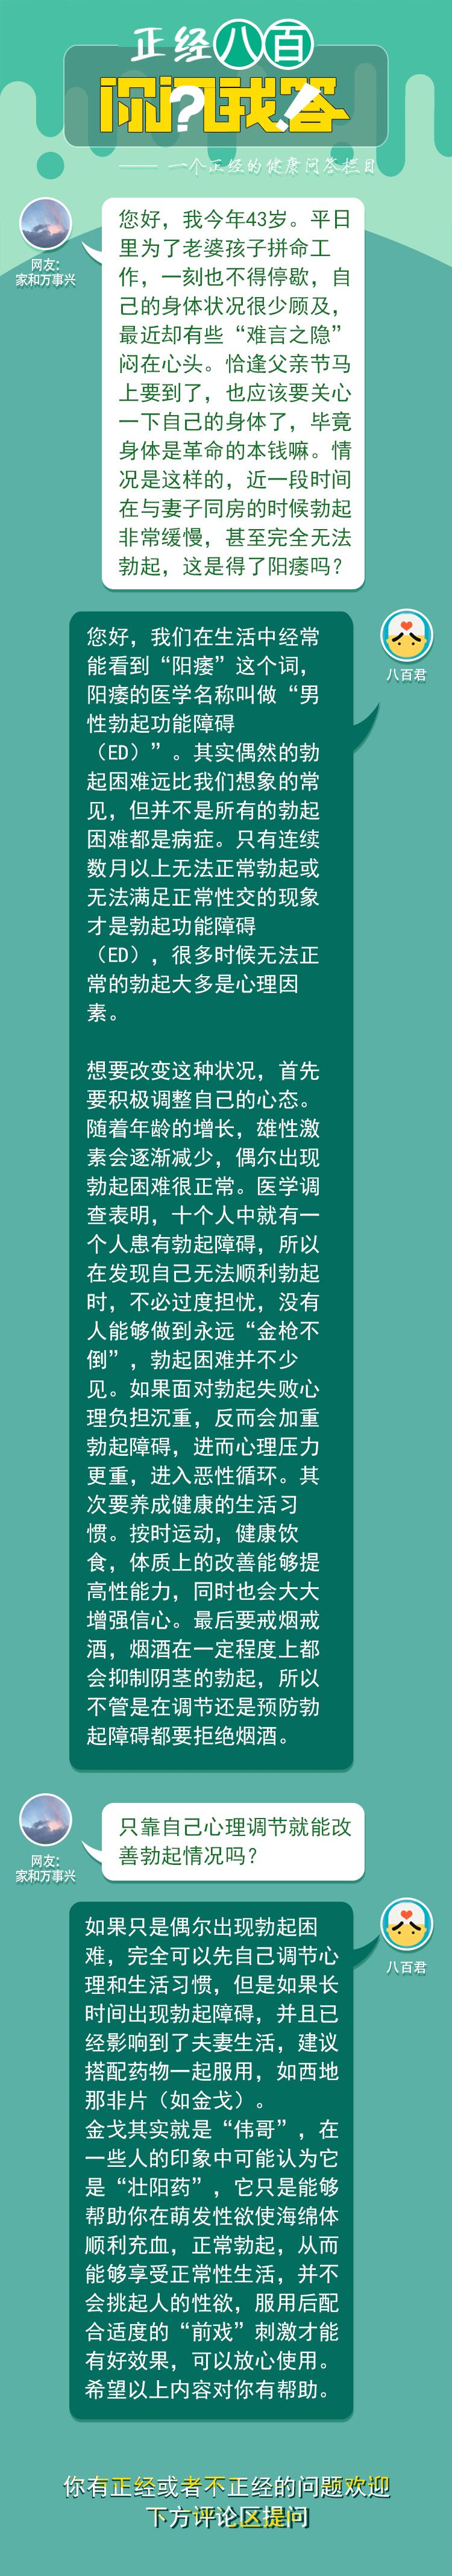 https://resource.chunyu.mobi/@/media/images/news/140041_740717f82e0e0bd0.png